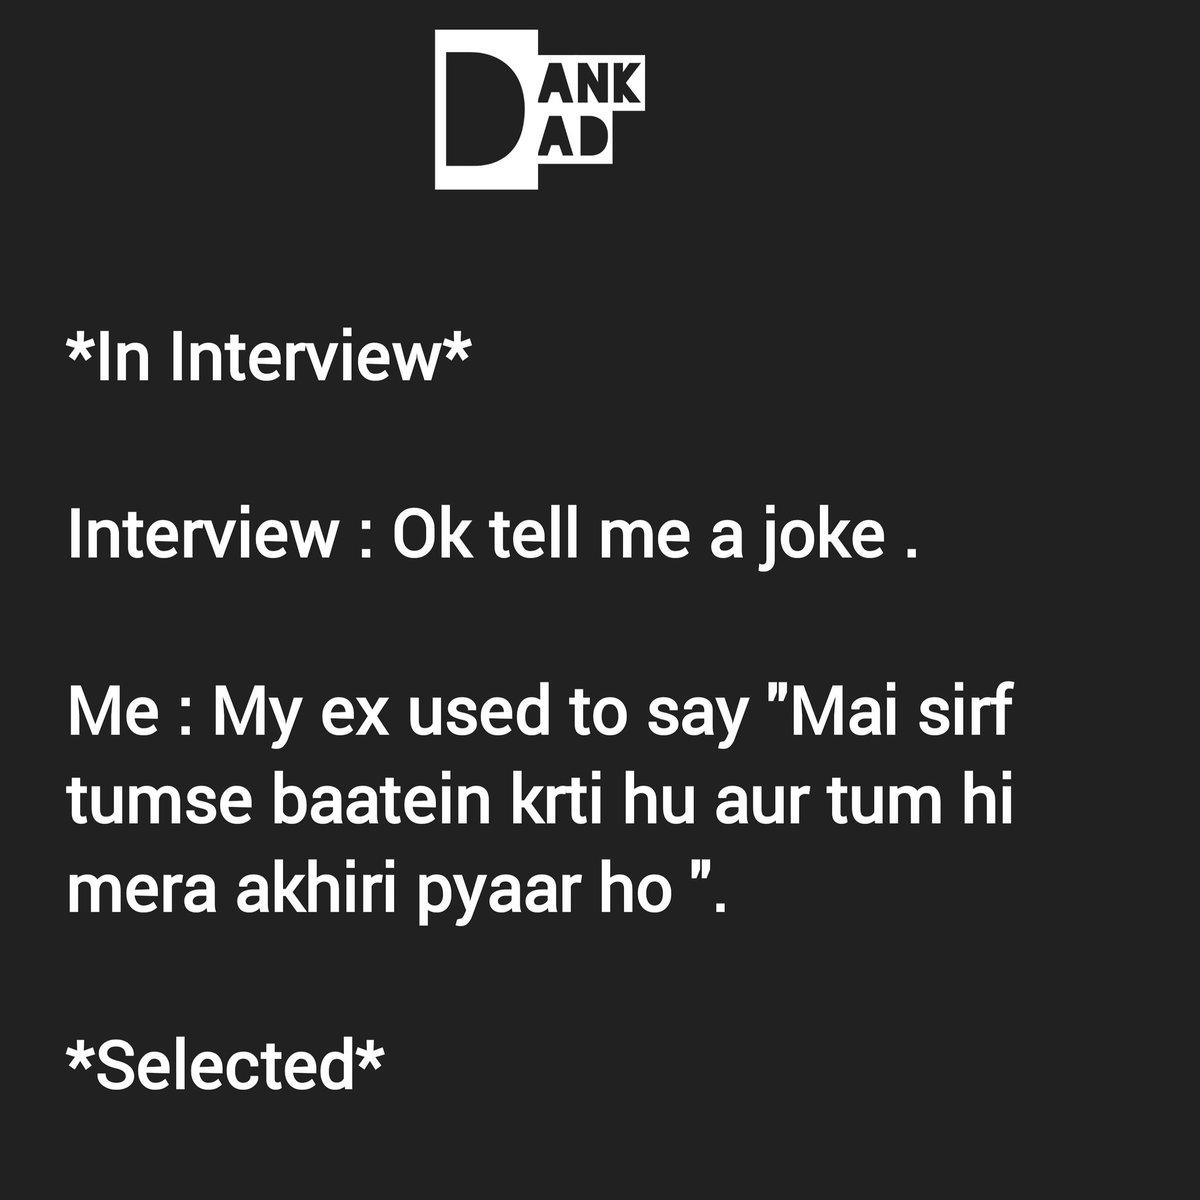 Follow @_dank_dad_ for more ....#fun #jokeoftheday #laugh  #dankjokes #nonvegjokes #follow #funny #jokes #sarcasm #FF #likes #comedyindia #backchodi #sacredmemes #bollywoodpic.twitter.com/QqkHAysqZ3